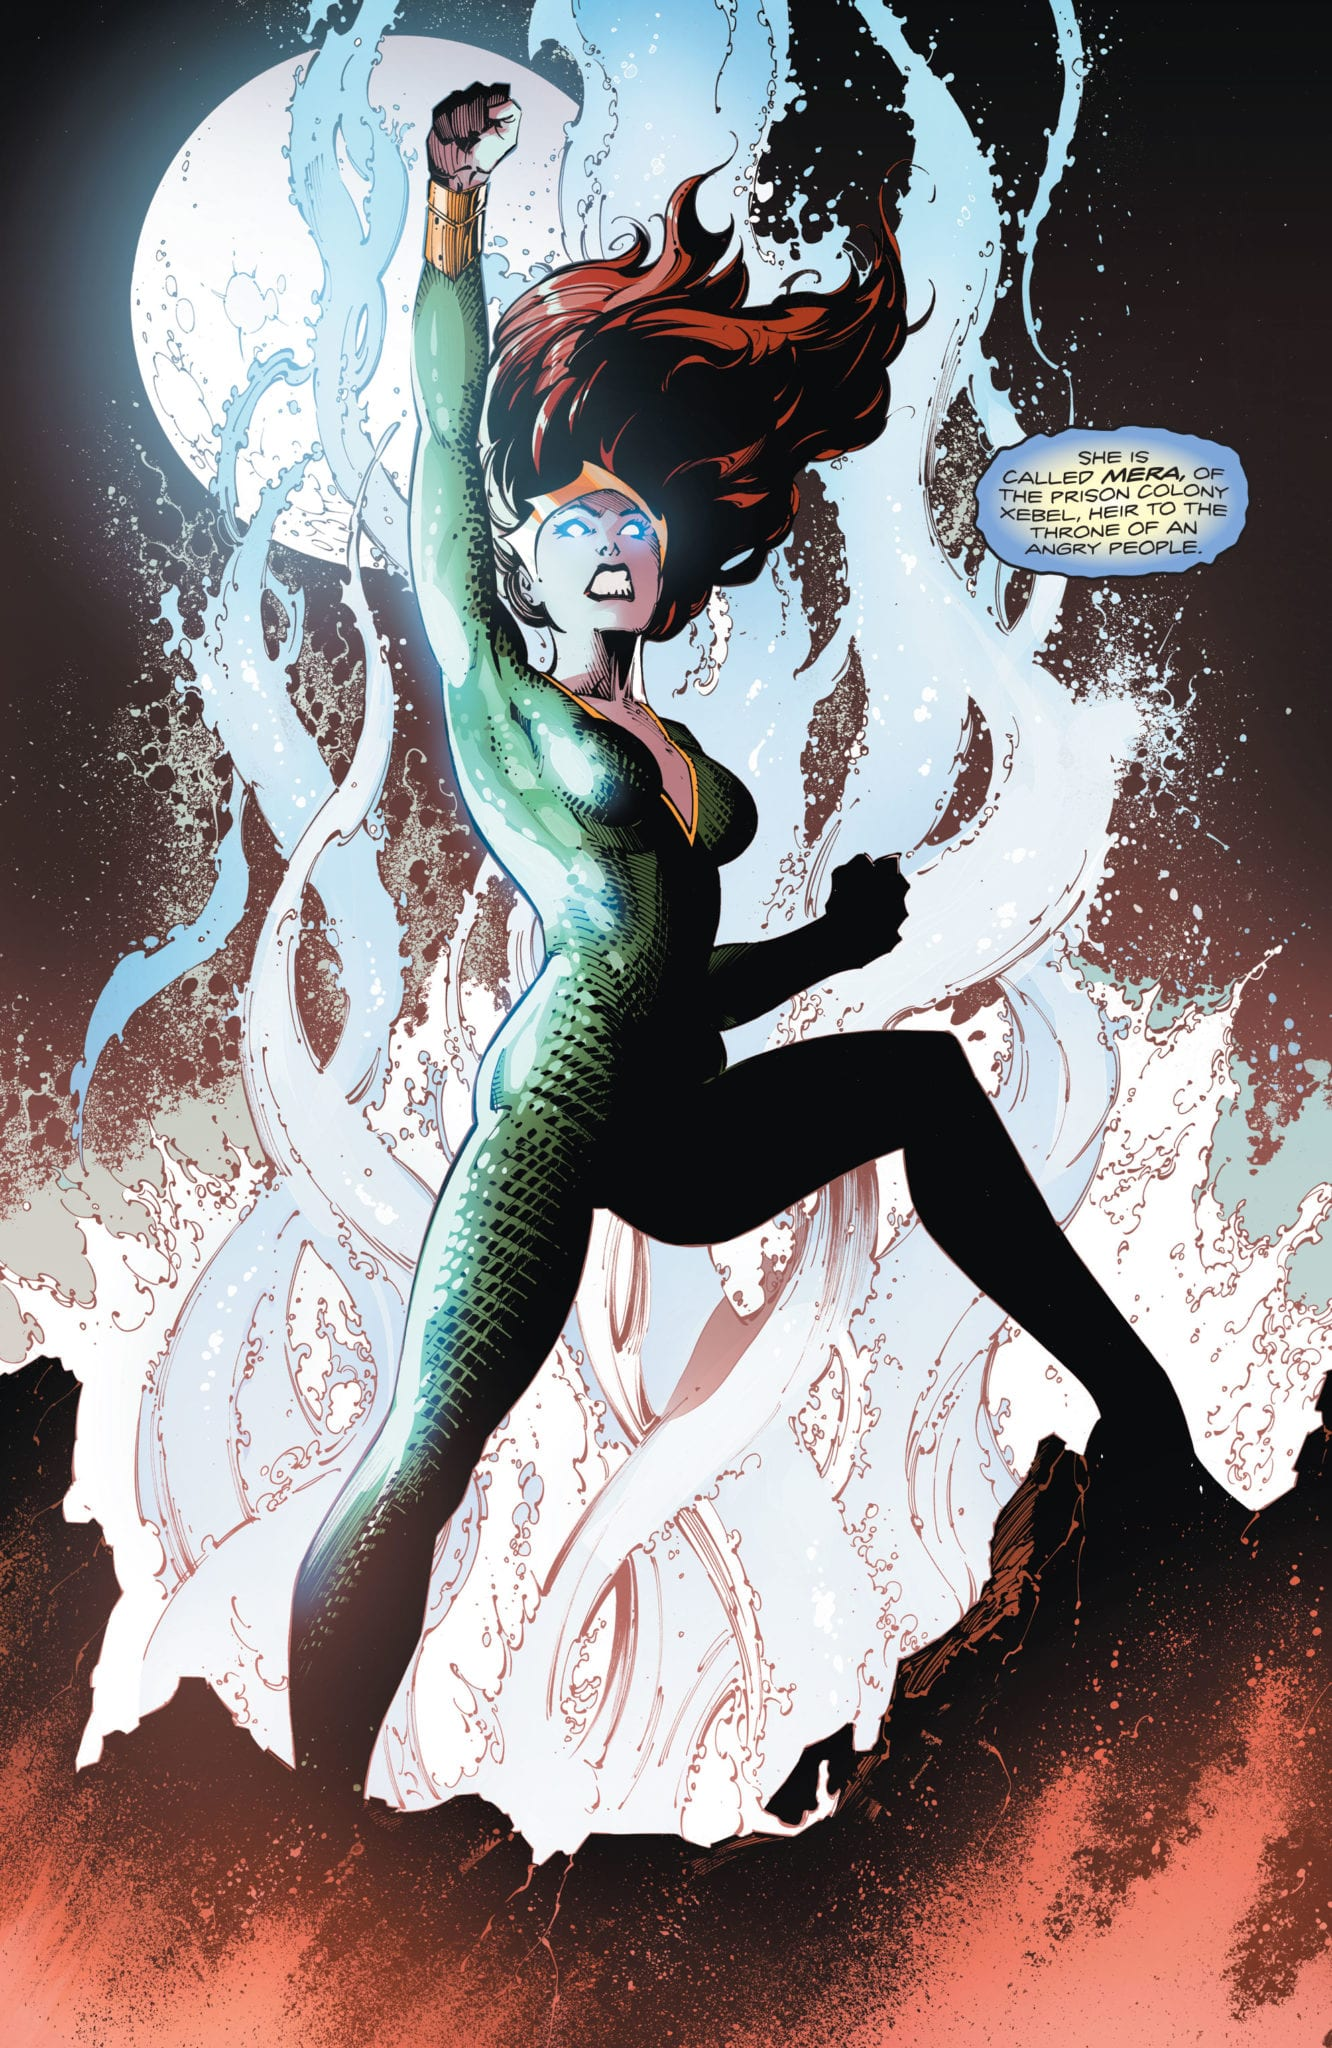 Mera, the Queen of Atlantis